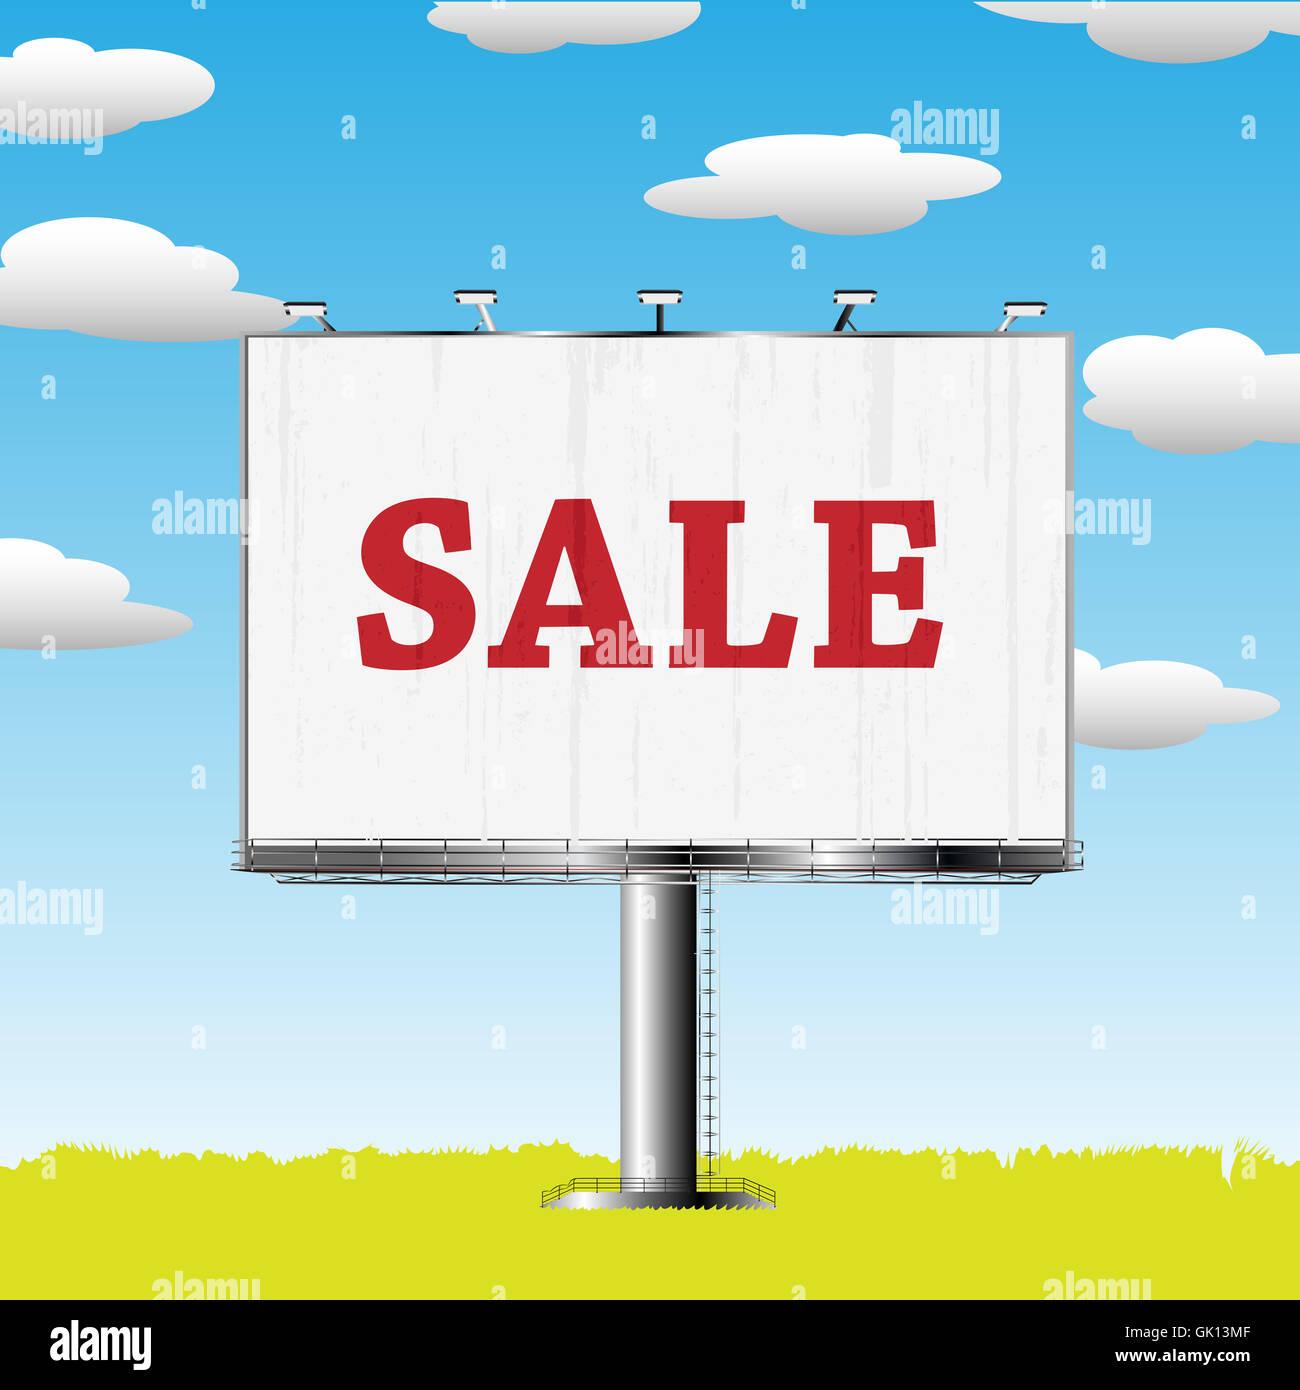 advancement advertisement advertise - Stock Image